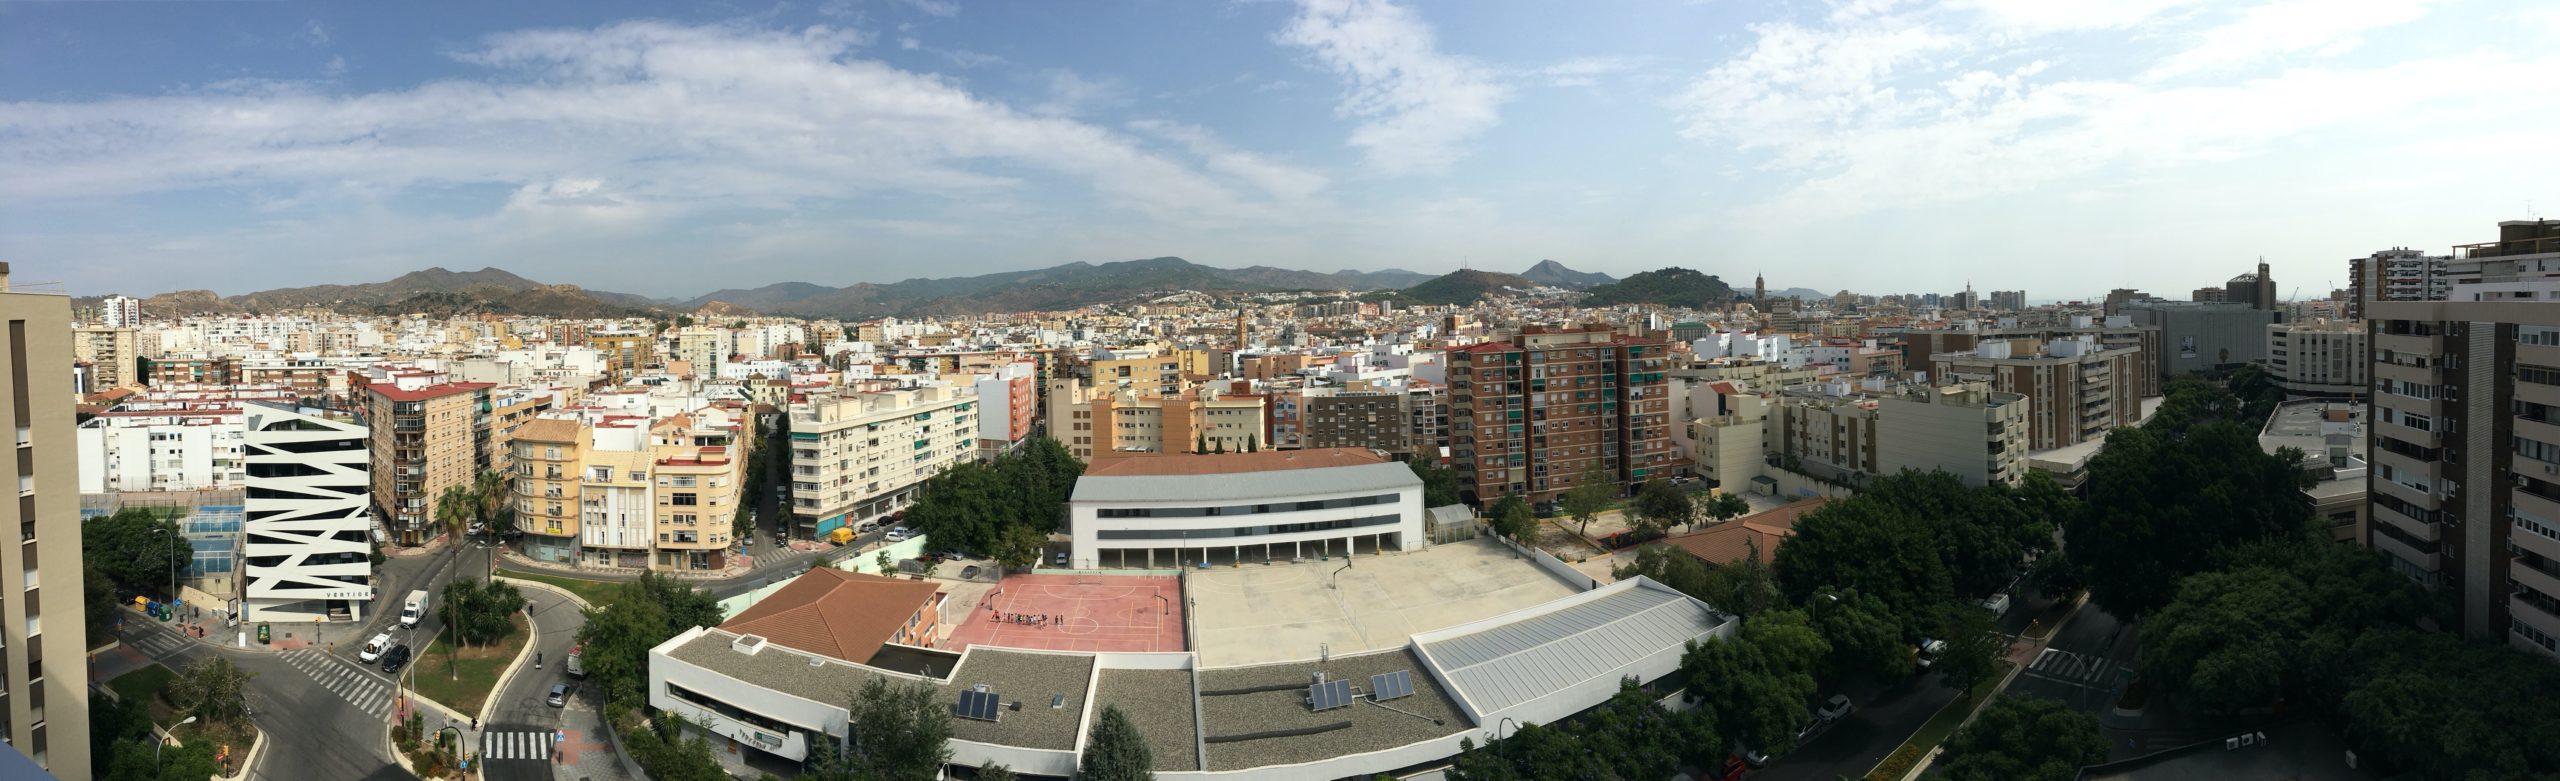 Vivienda en Calle Esperanto, Málaga